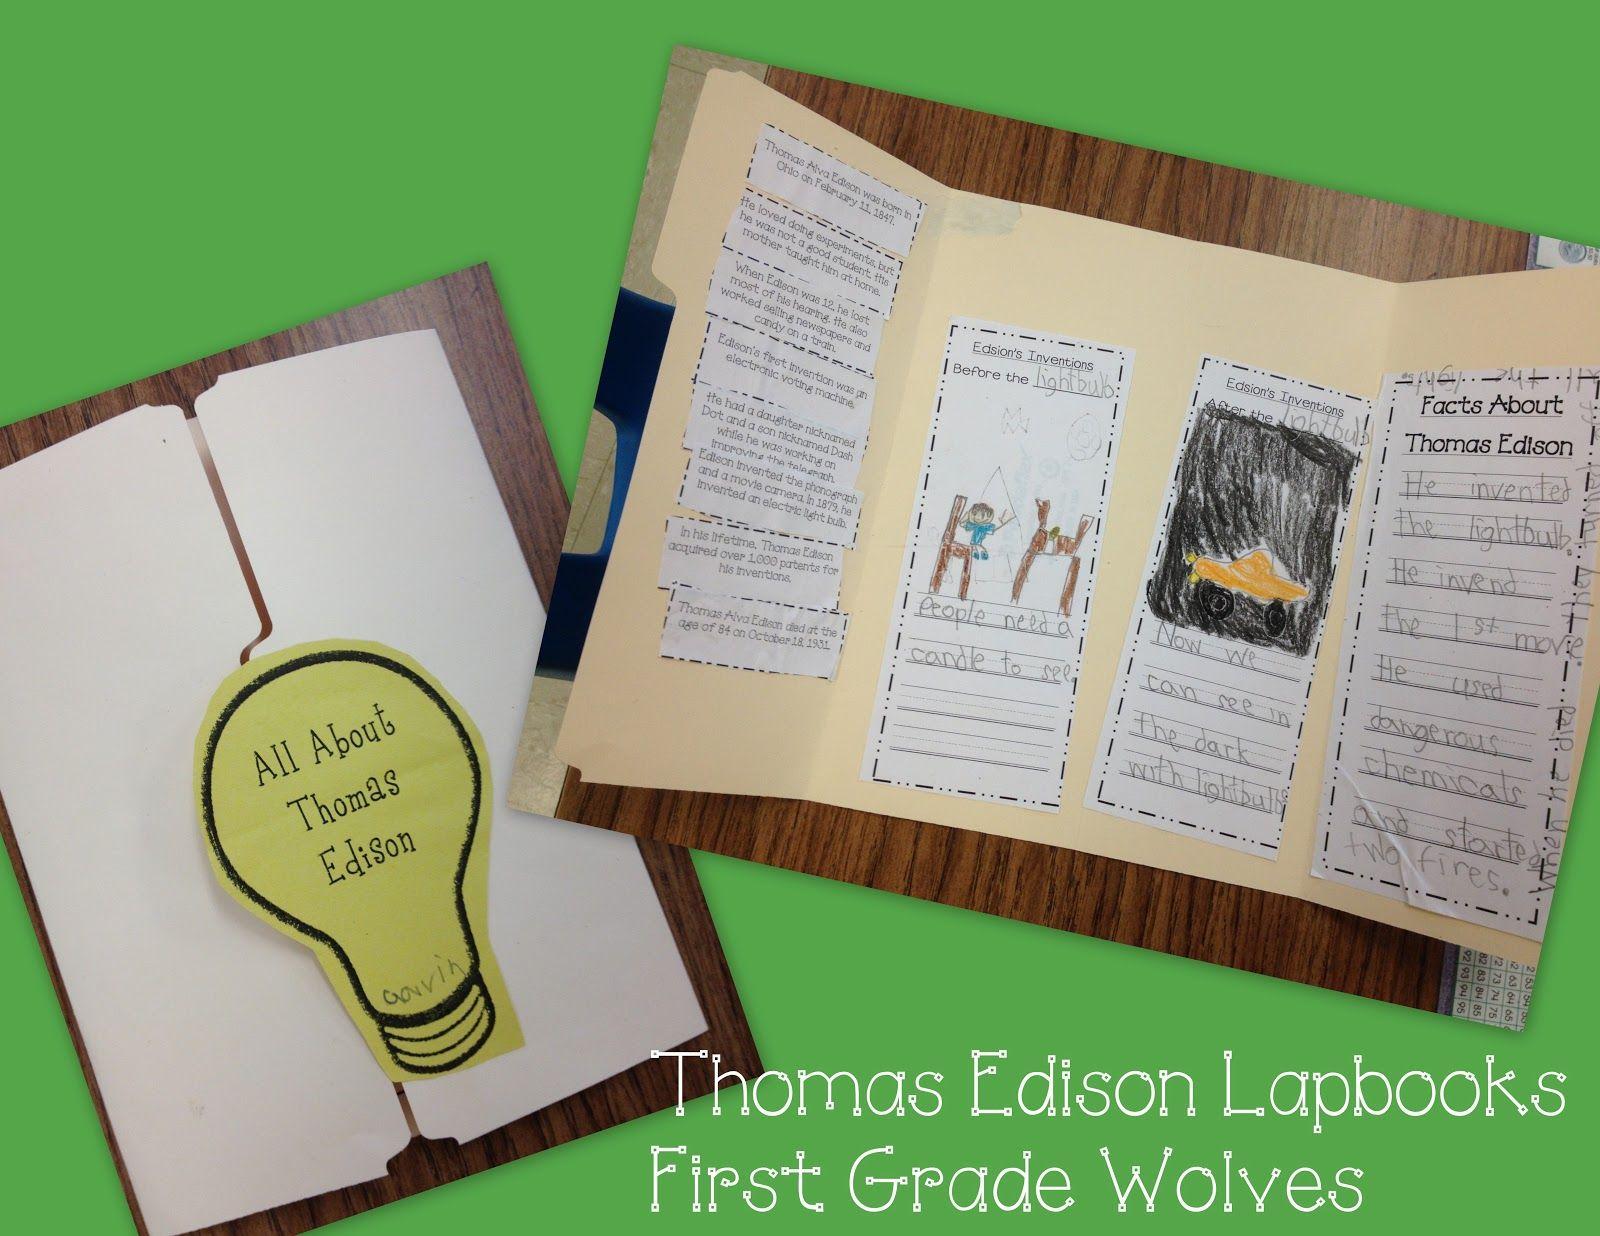 Thomas Edison Lapbook Freebies